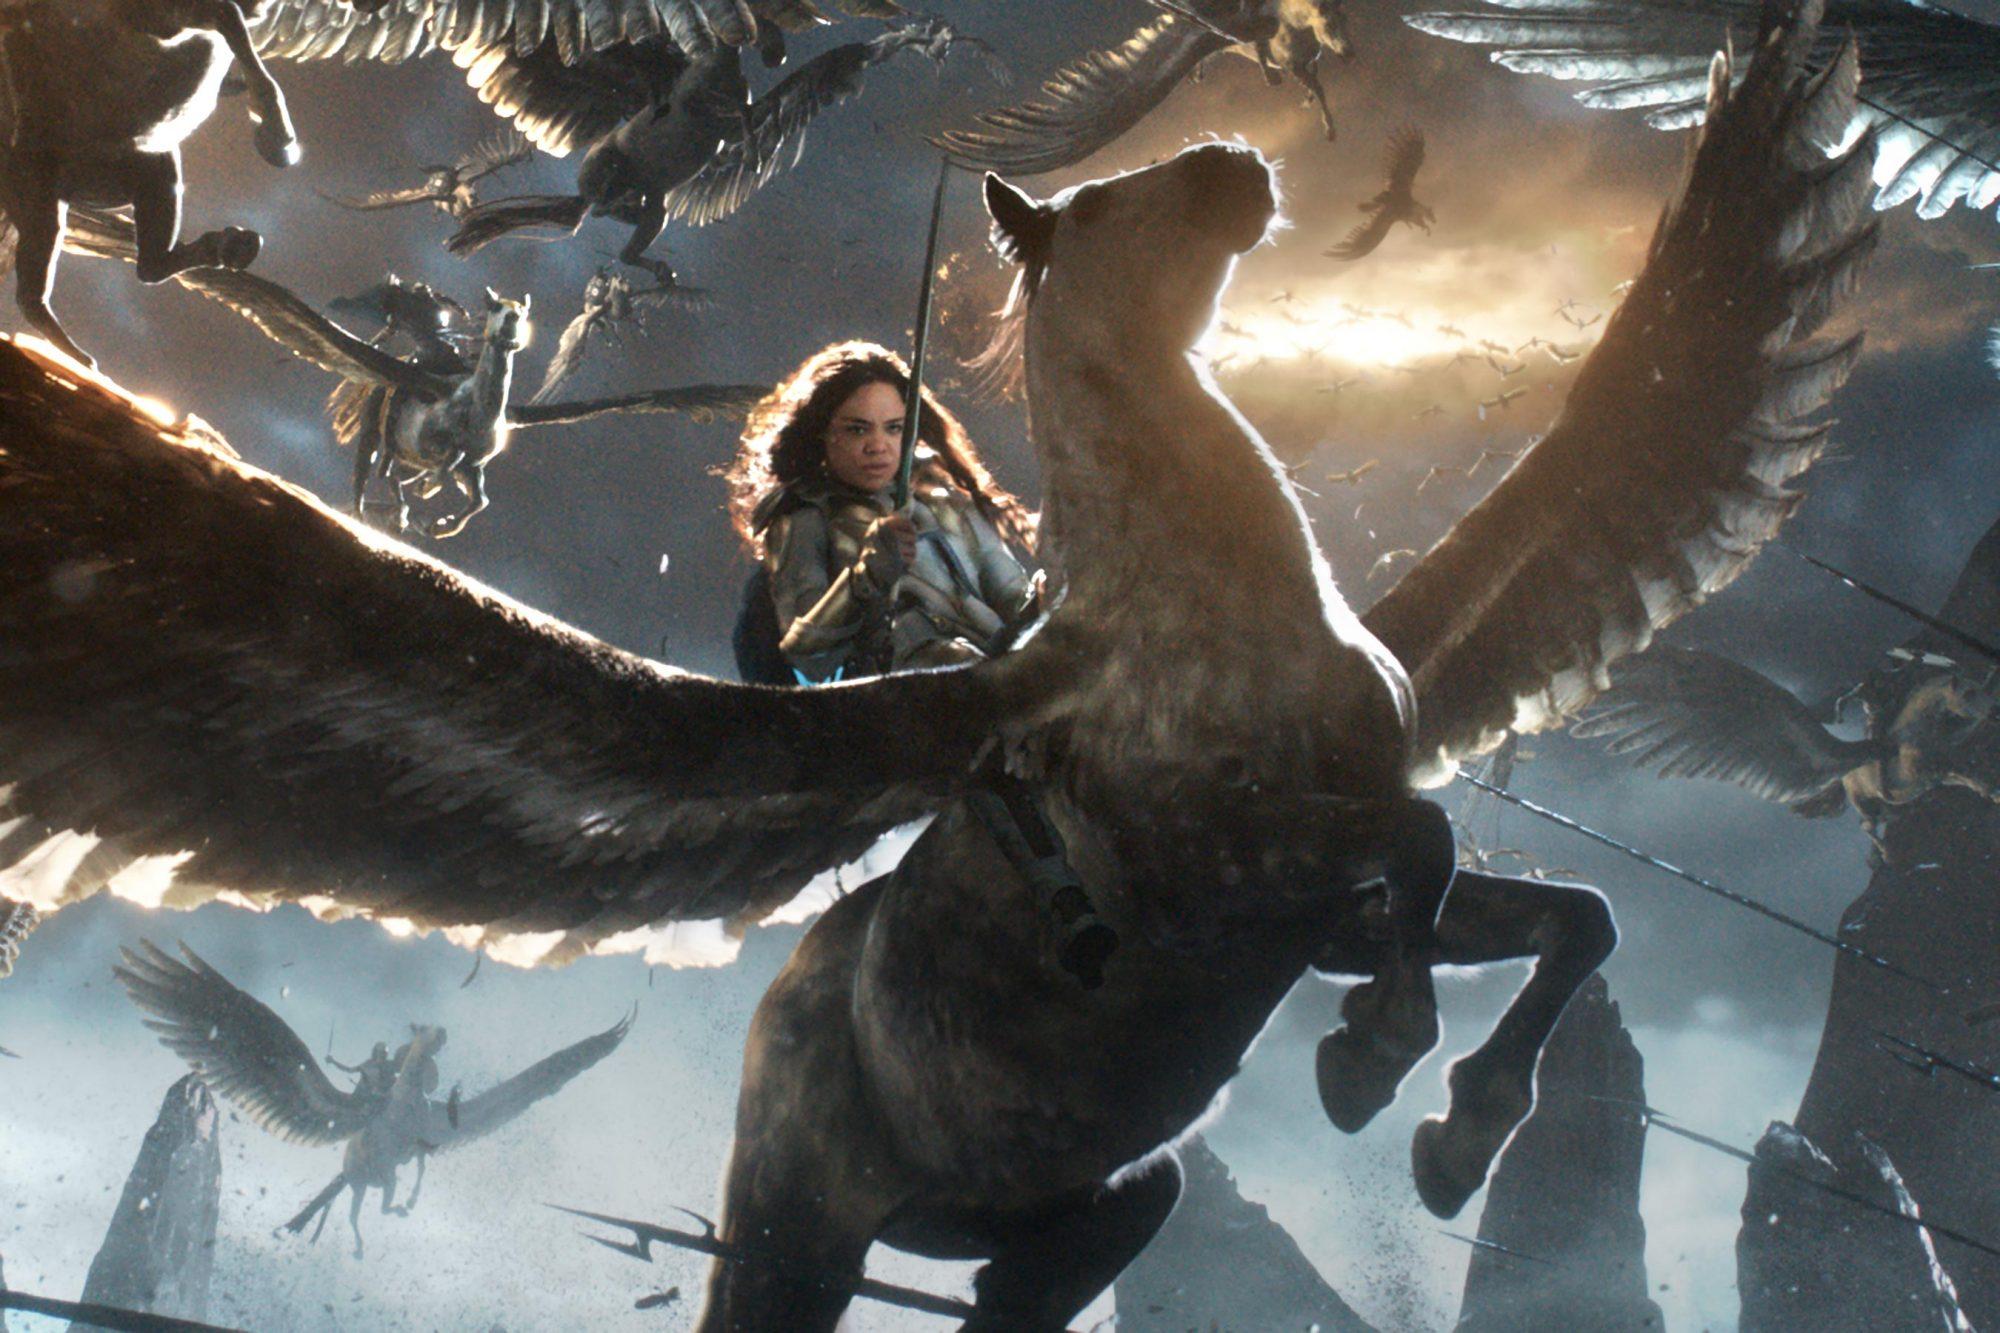 6. Ride of the Valkyrie (Thor: Ragnarok, 2017)